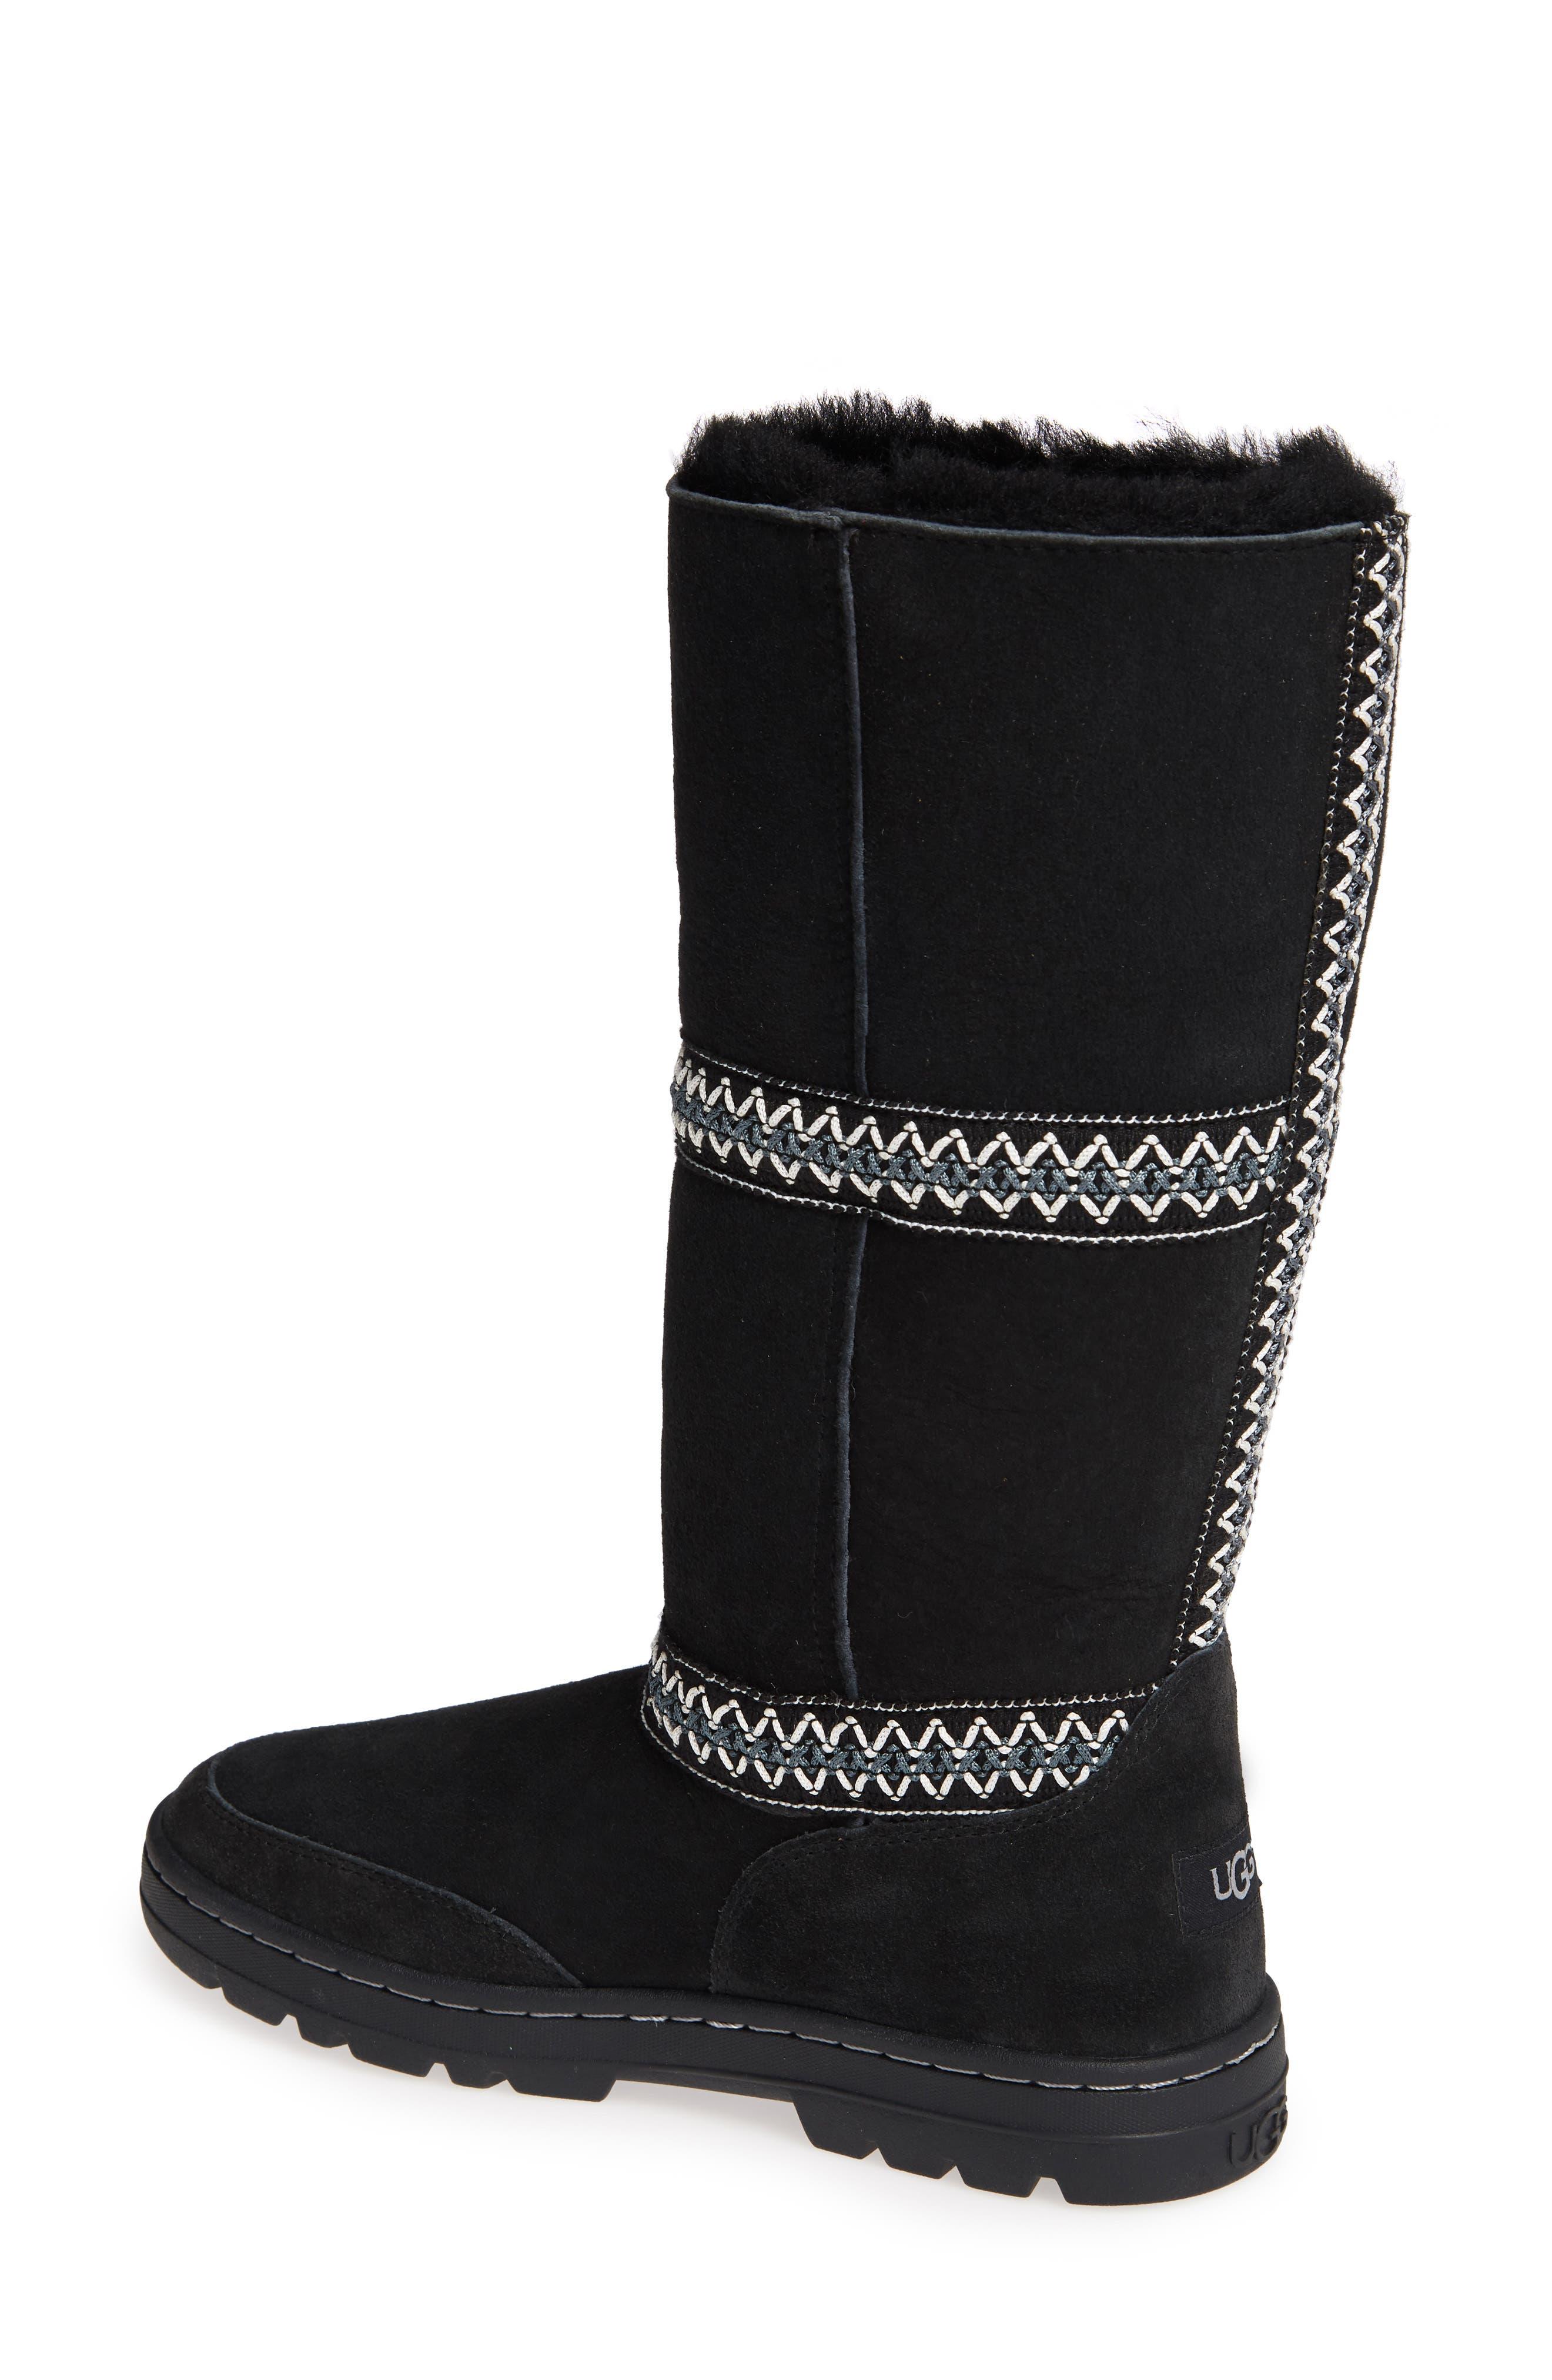 Sundance Revival Genuine Shearling Boot,                             Alternate thumbnail 3, color,                             BLACK